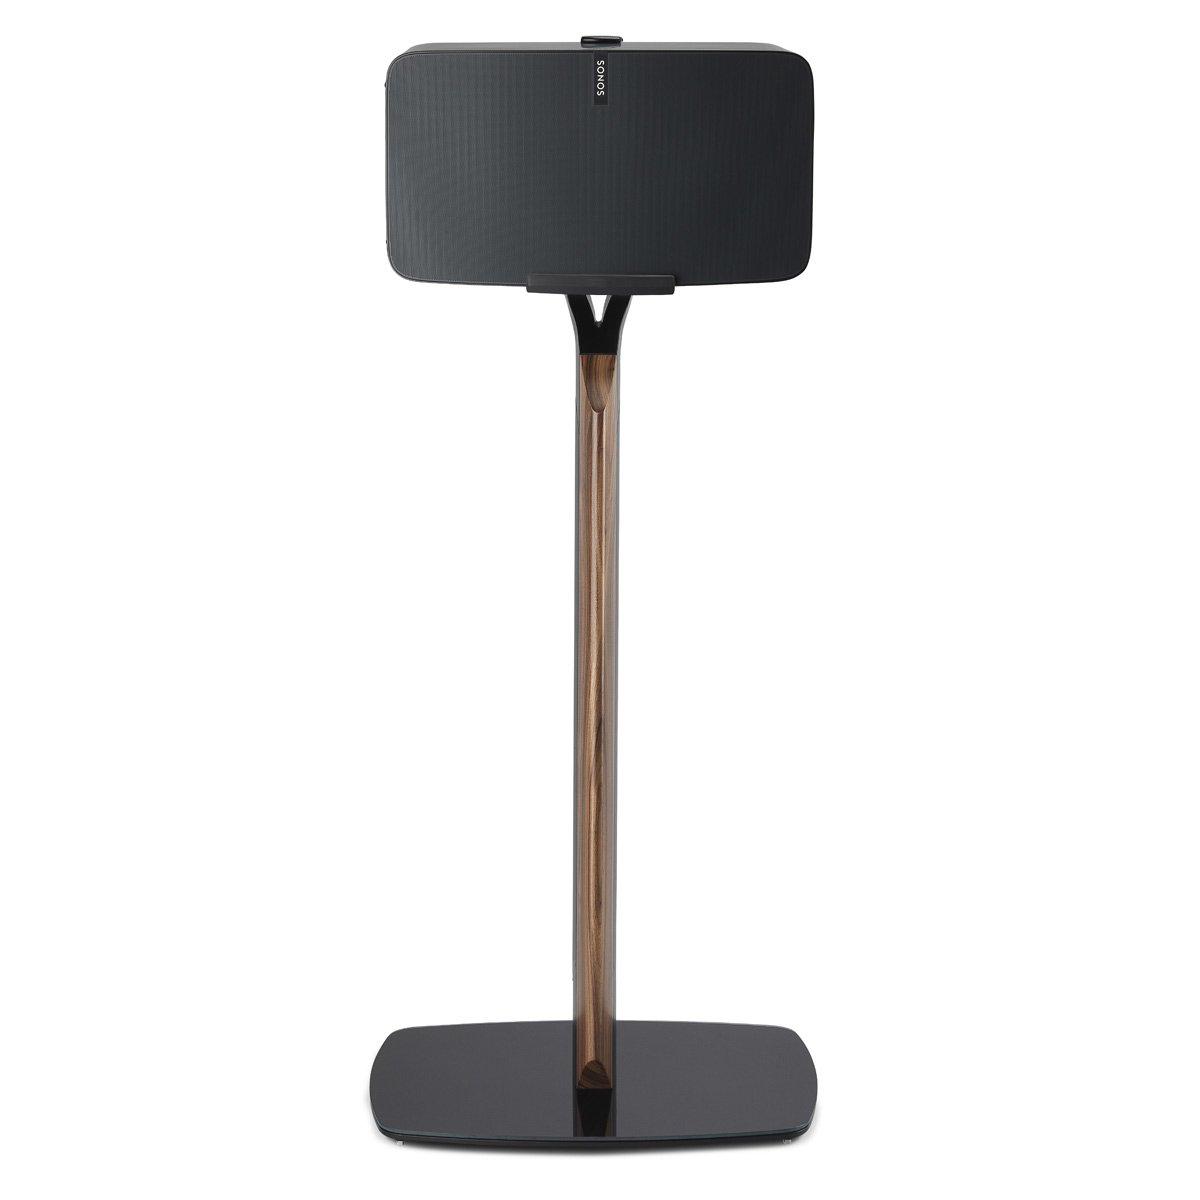 Flexson Premium Floor Stand for Sonos PLAY:5 (Black Walnut)